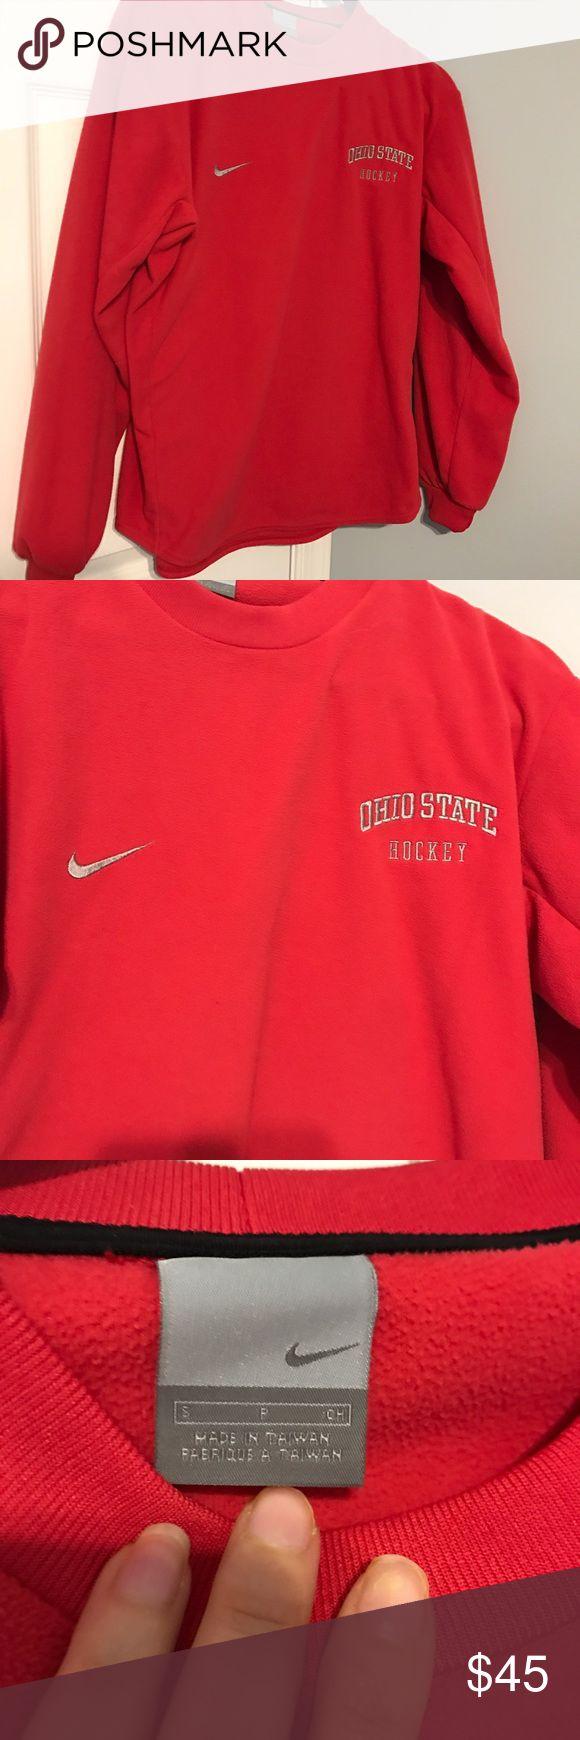 Nike Ohio state hockey sweatshirt. Small Ohio state hockey sweatshirt. Worn a small handful of times. EEUC Nike Tops Sweatshirts & Hoodies